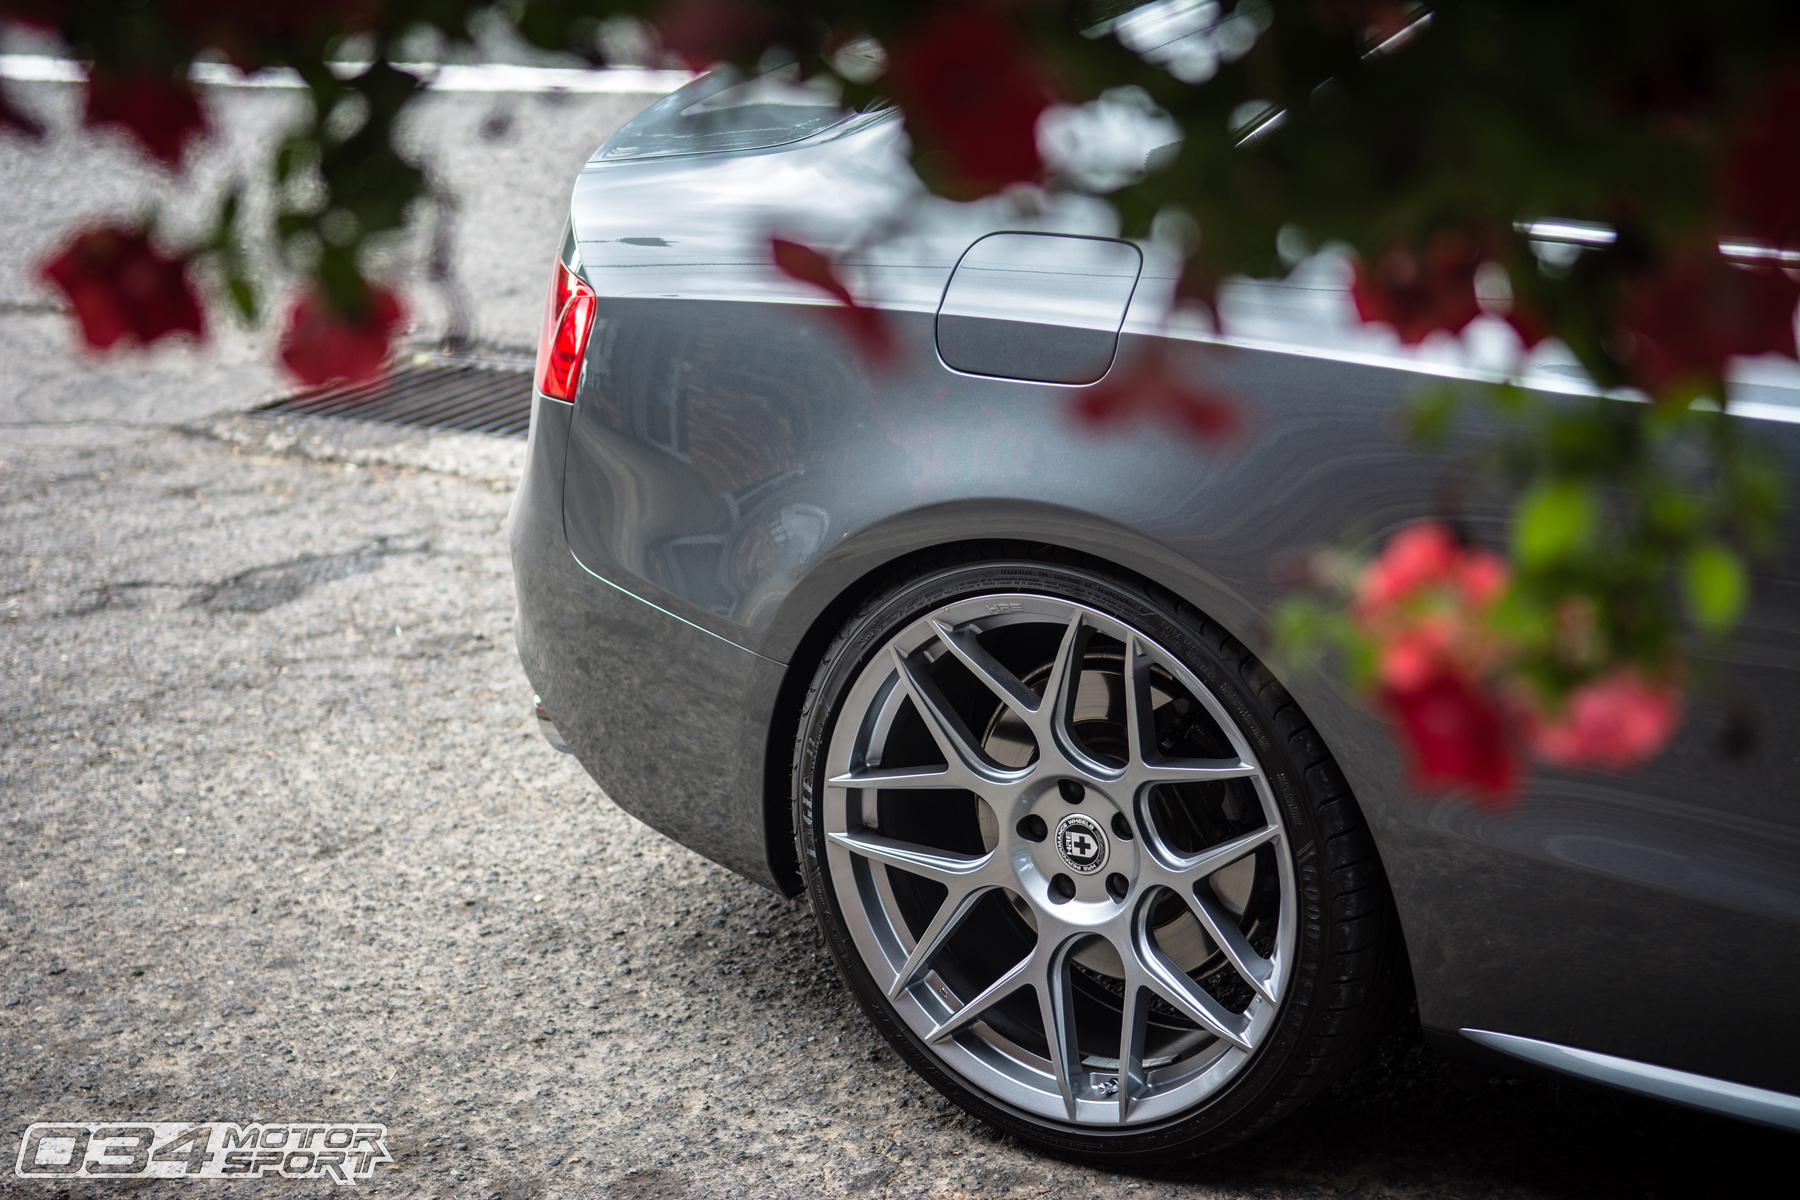 Lowered Monsoon Gray B8.5 Audi S5 on HRE FF01 FlowForm Wheels